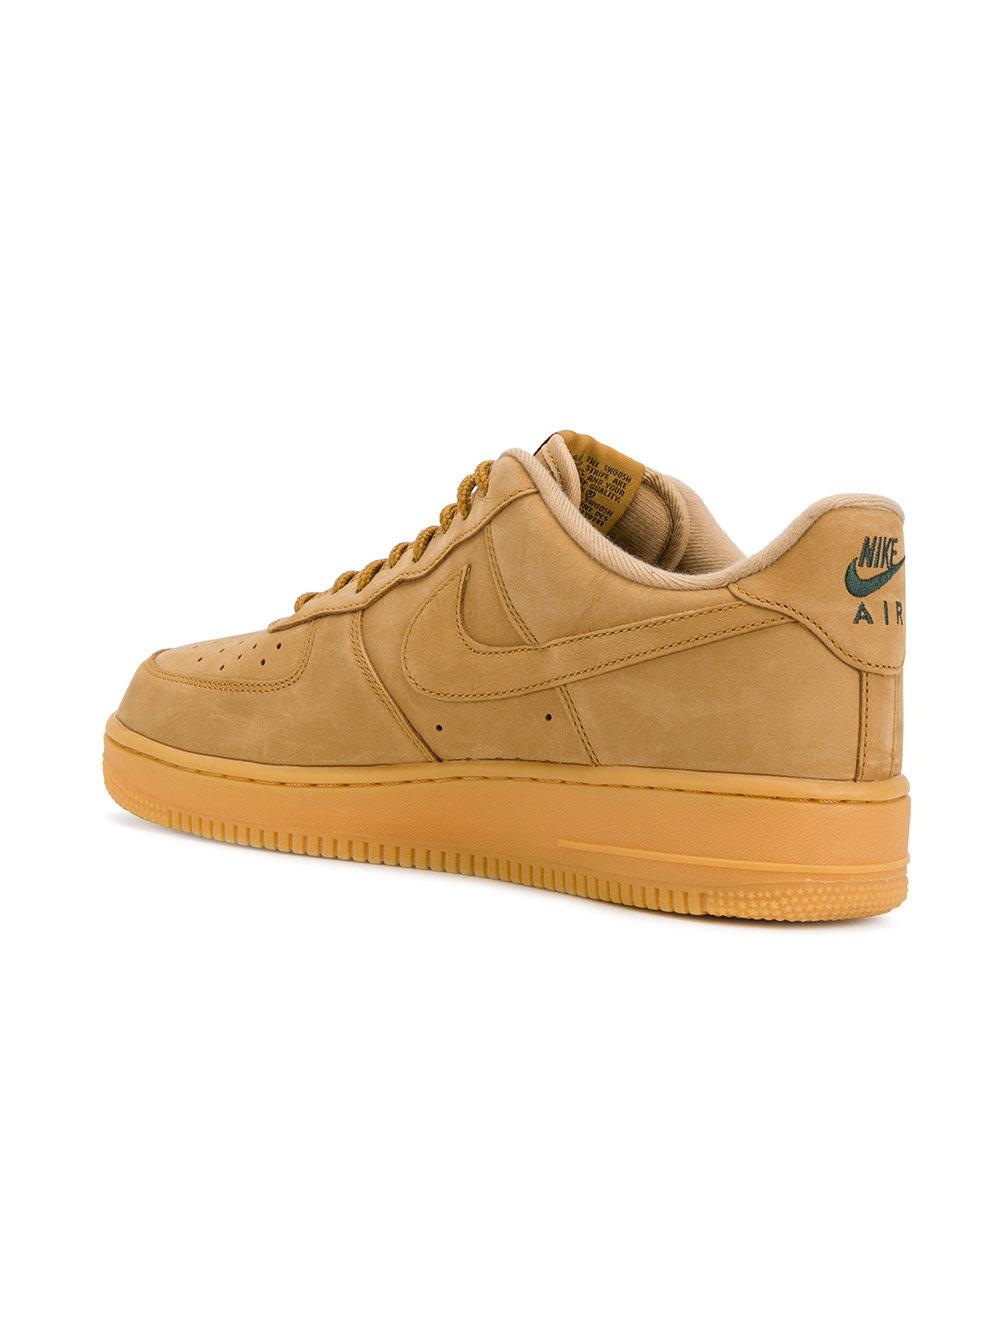 Lyst - Nike Air Force 1 Low Sneakers In Natural For Men-5038